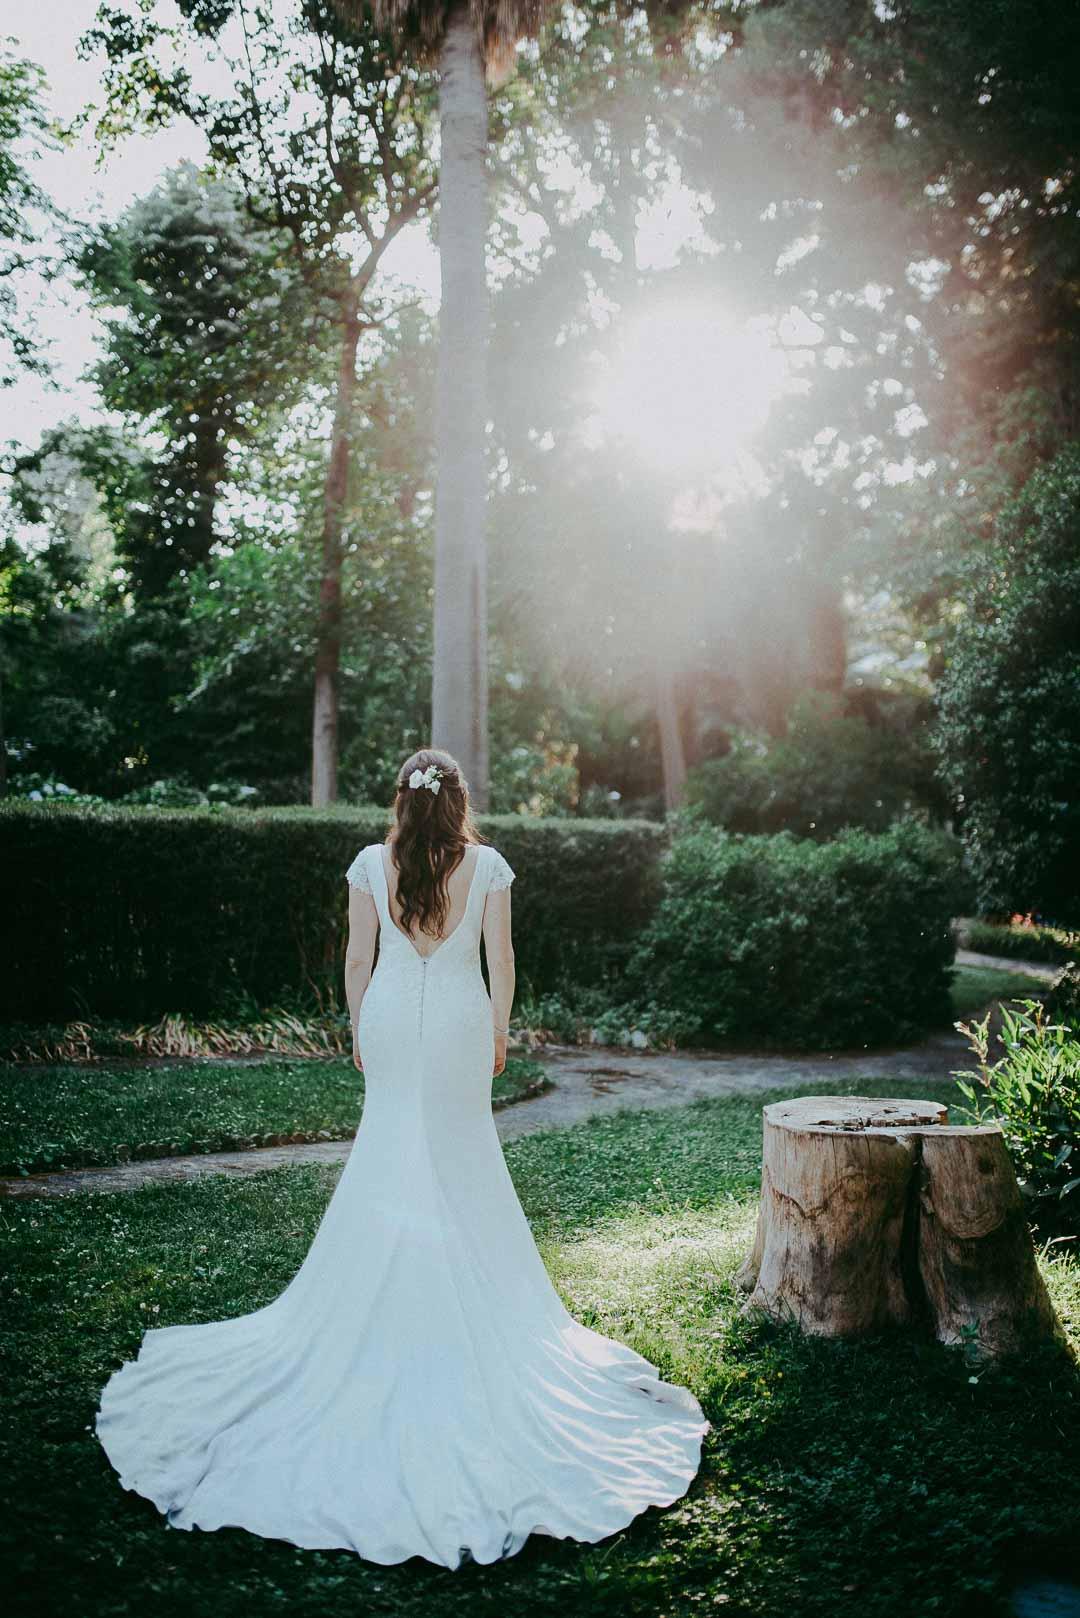 wedding-photographer-destination-fineart-bespoke-reportage-sorrento-parcodeiprincipi-vivianeizzo-spazio46-82